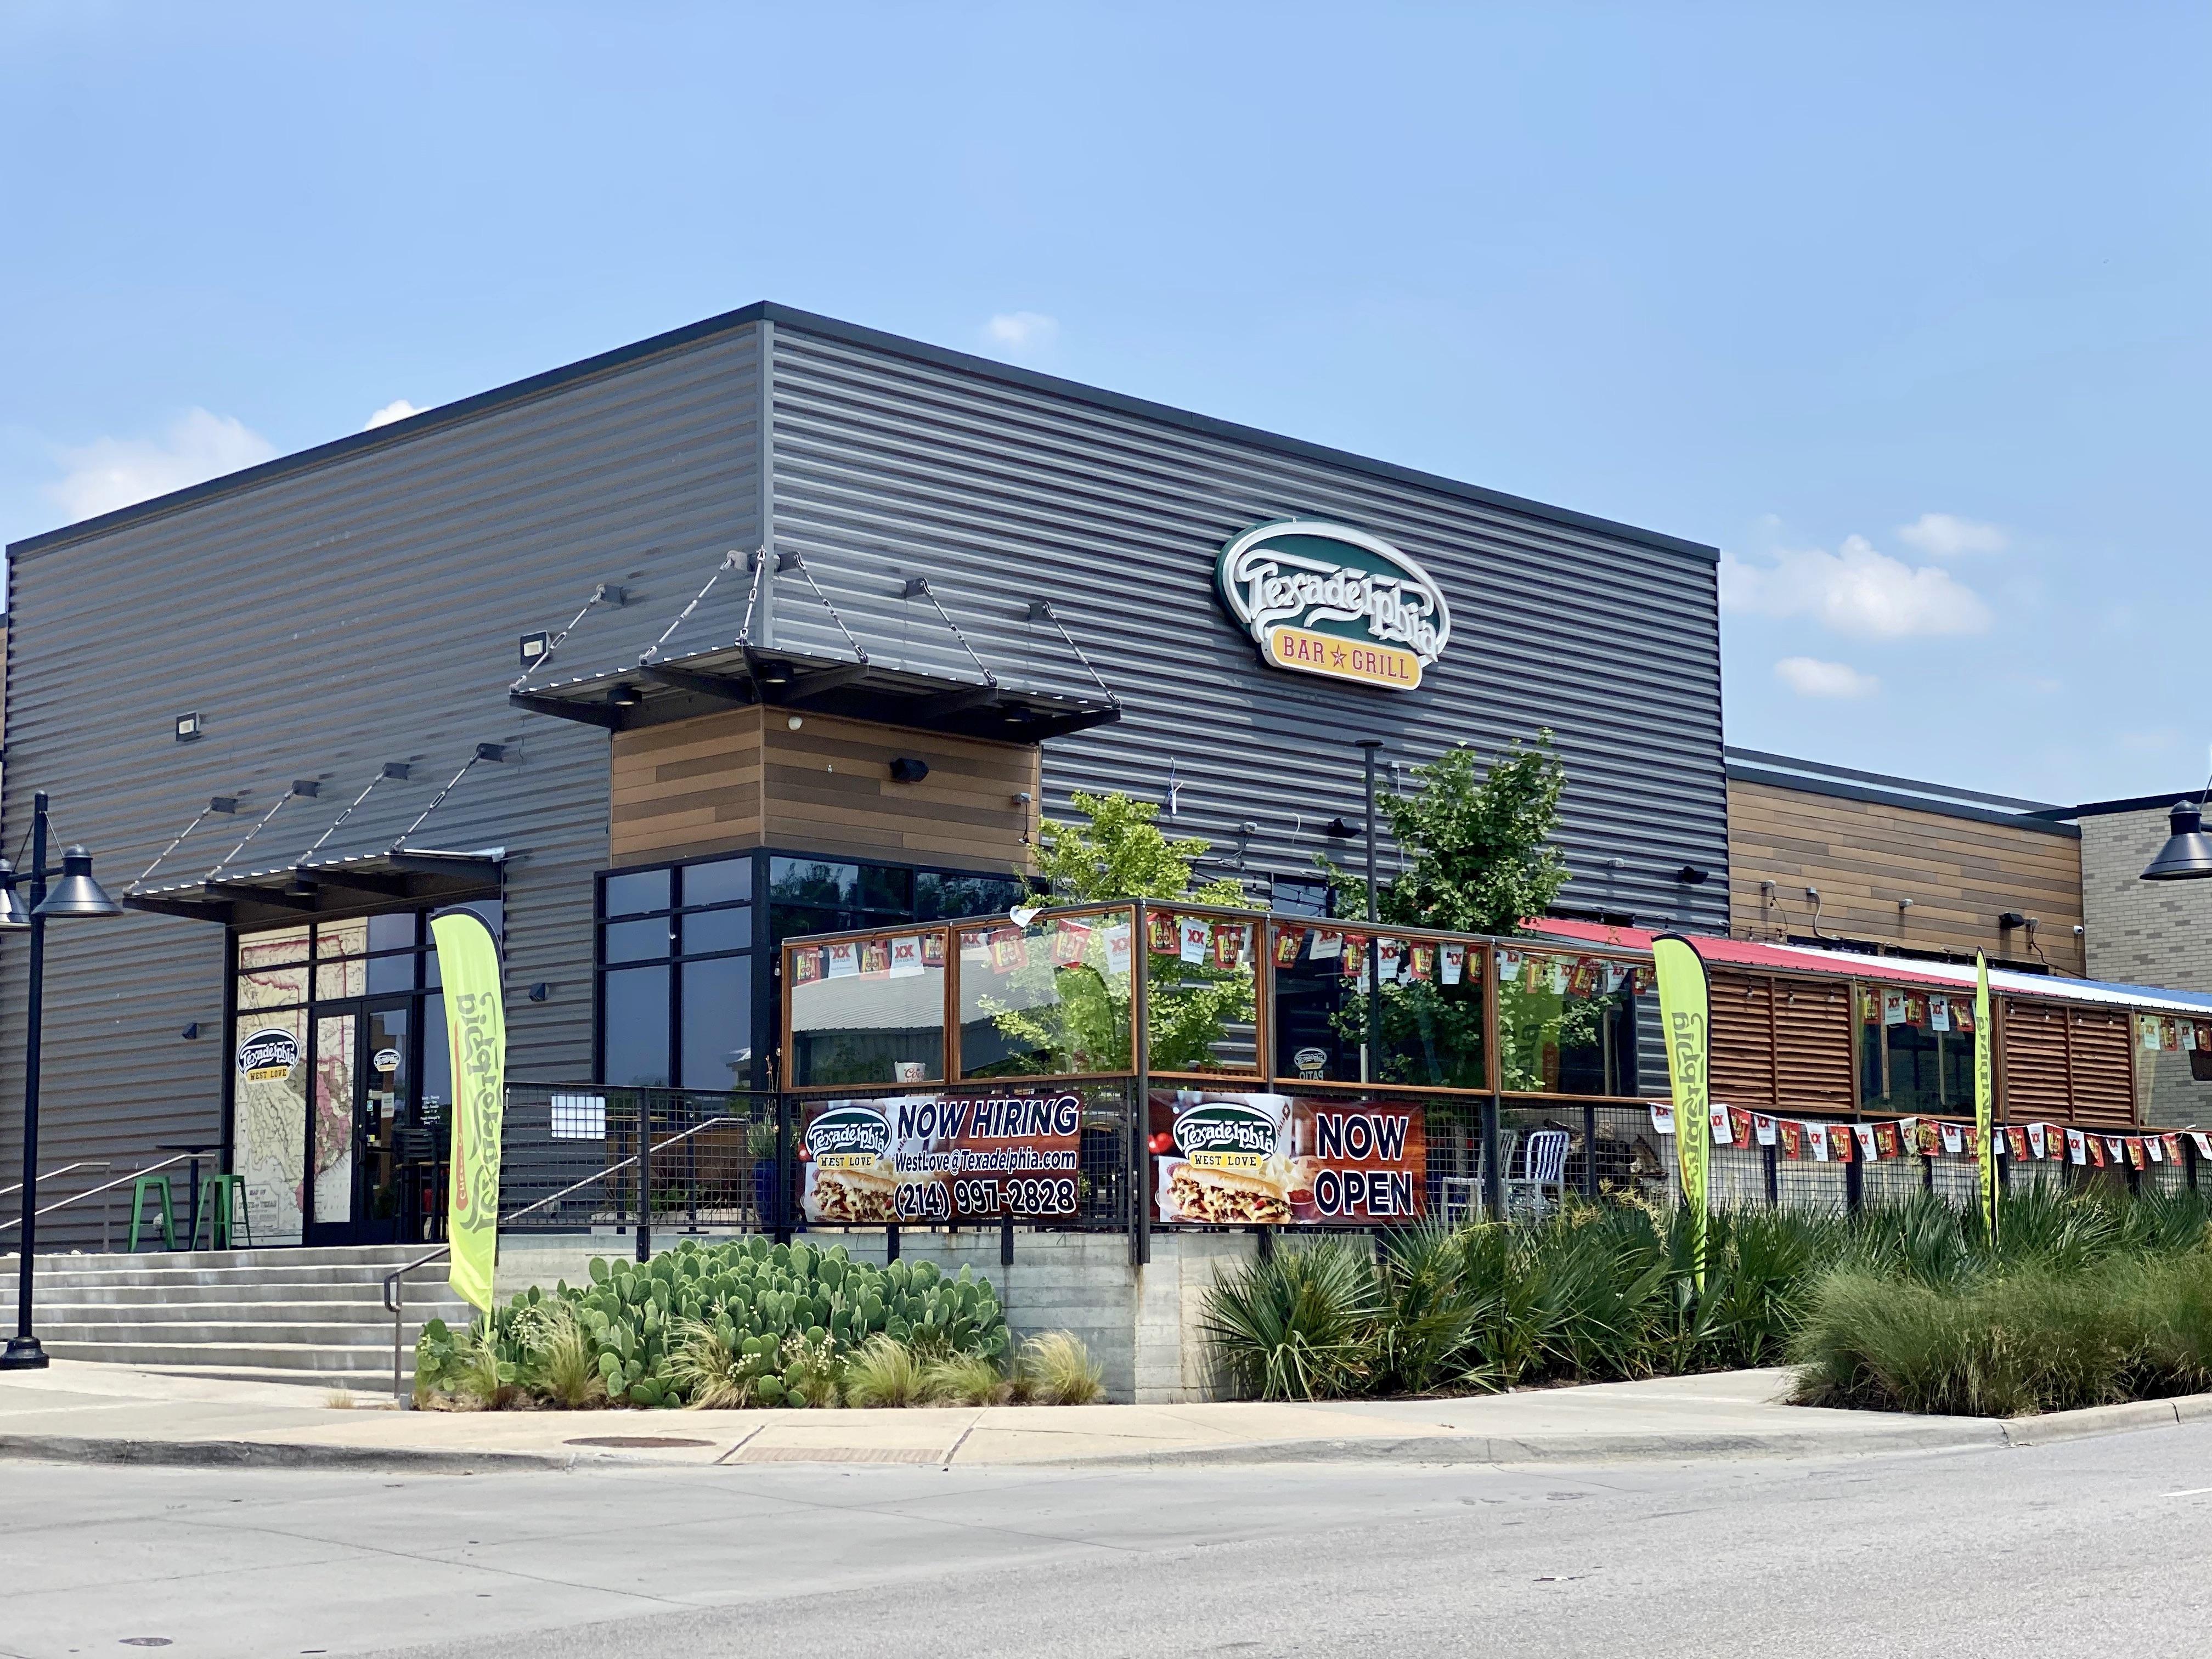 Northwest Dallas Restaurants on W Mockingbird Ln